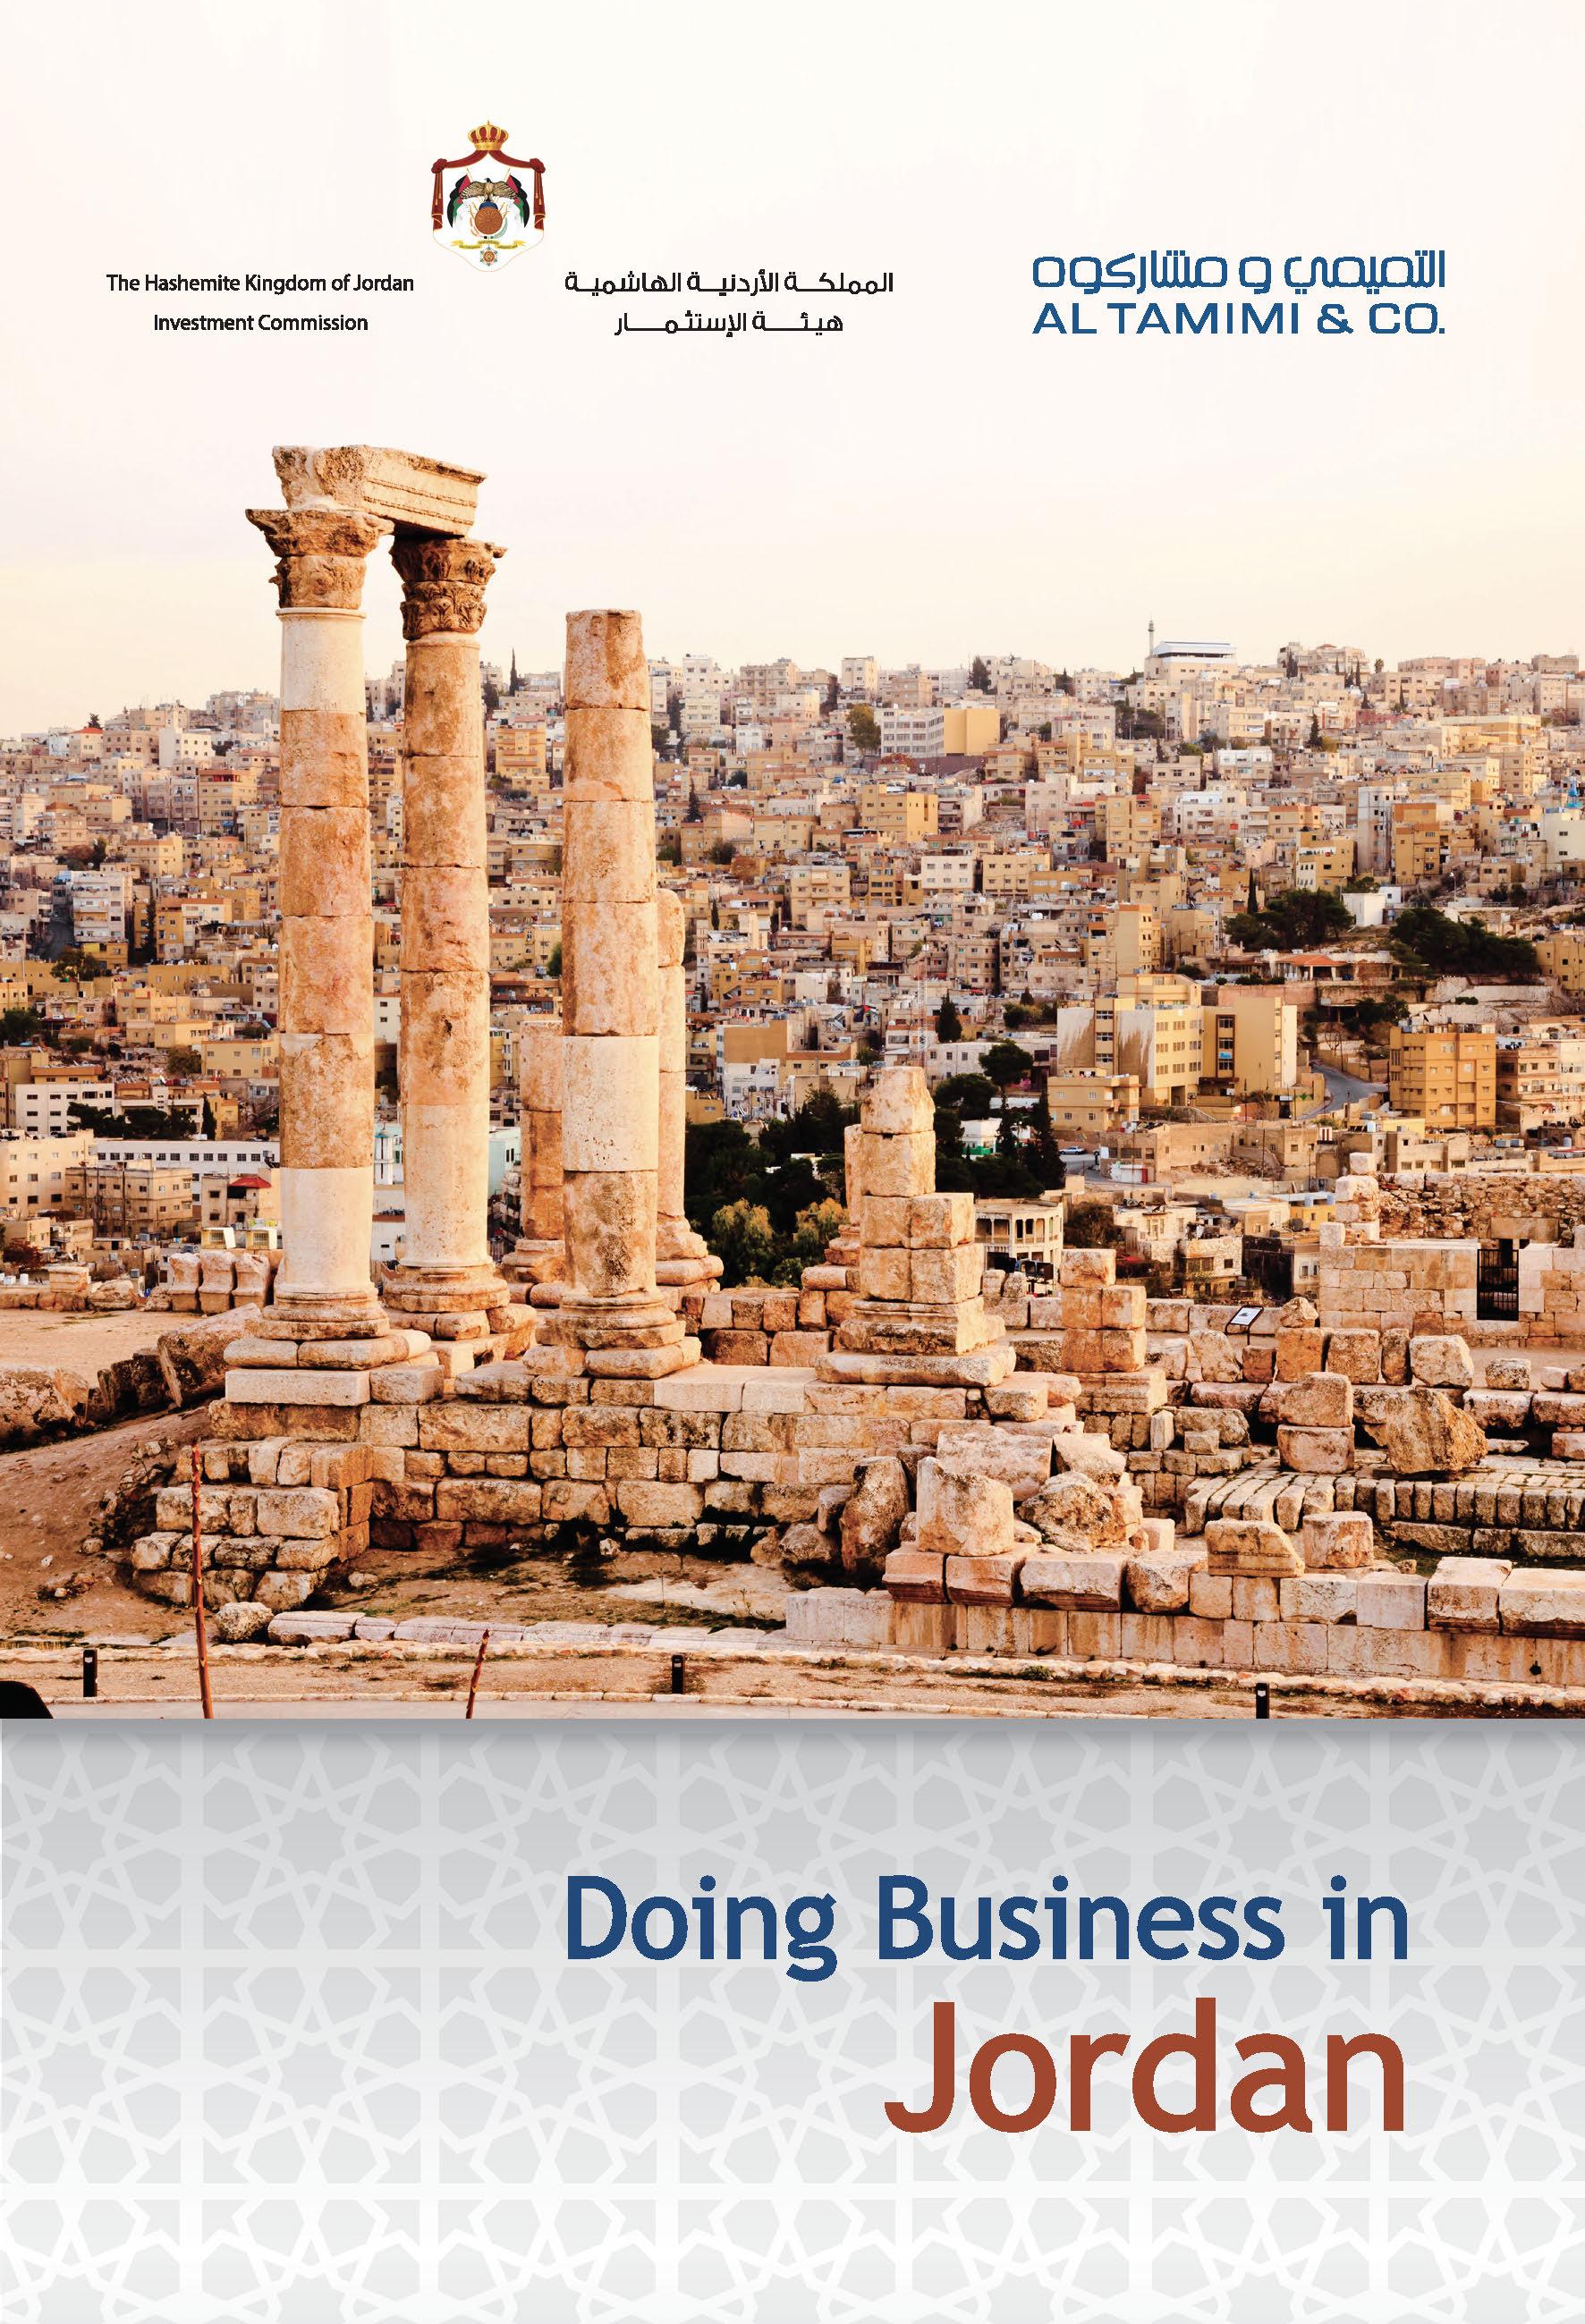 Doing Business in Jordan